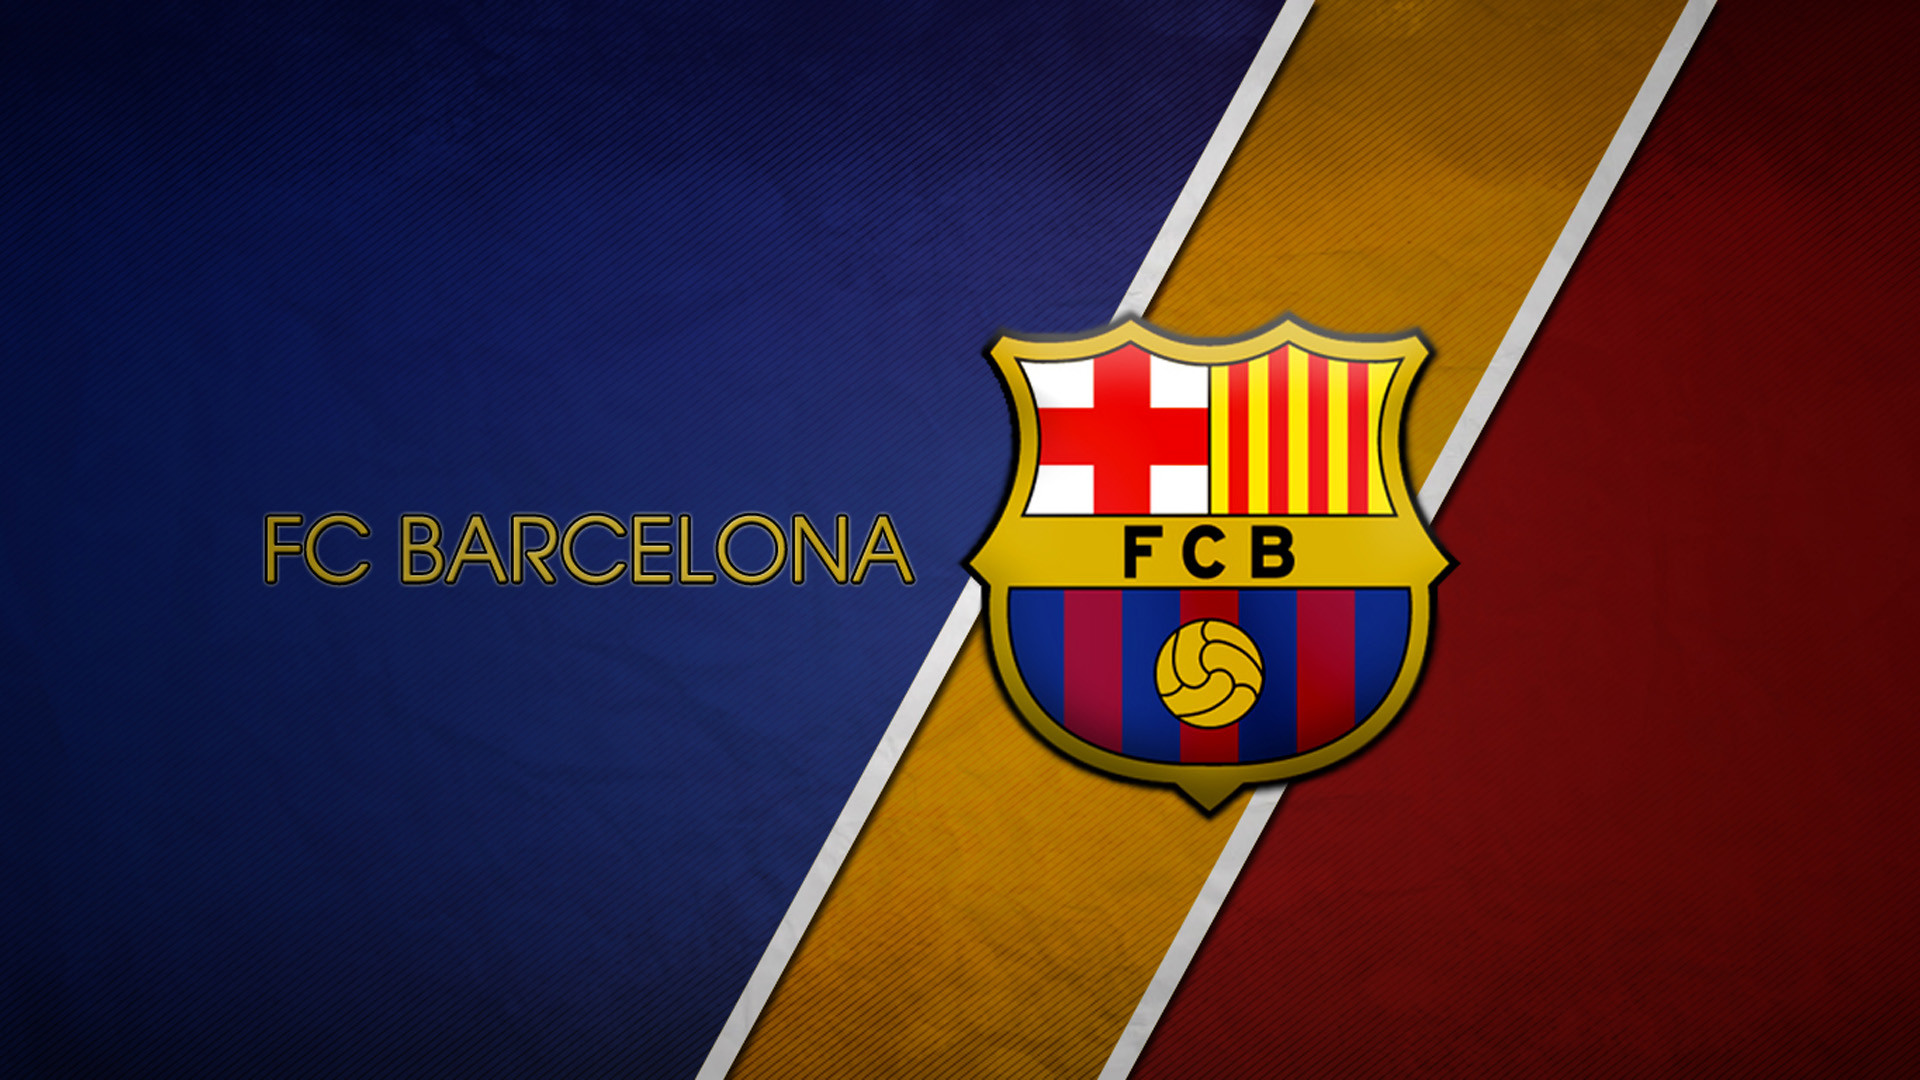 Barcelona Logo Wallpaper.